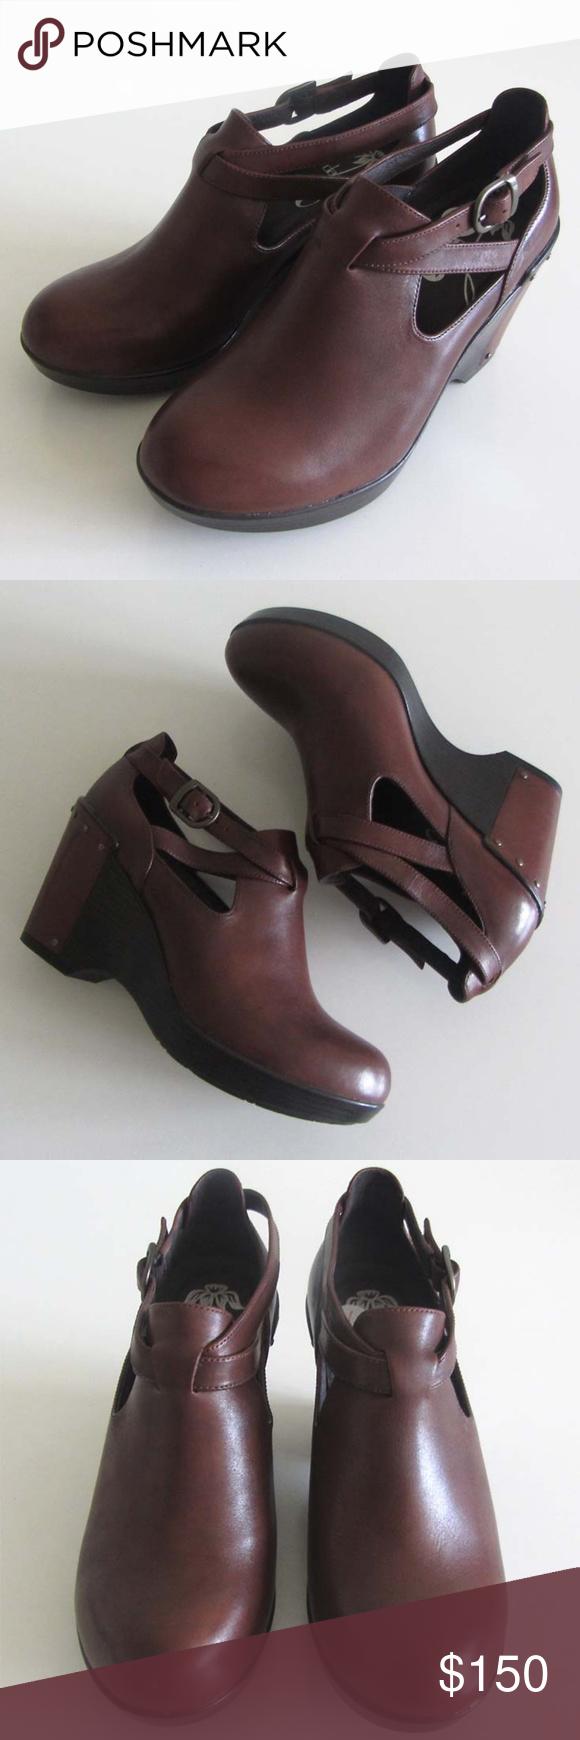 267e235418 Dansko Franka brandy strap wedge shoes 36 6 Dansko Franka ( style    1901767800 ) round